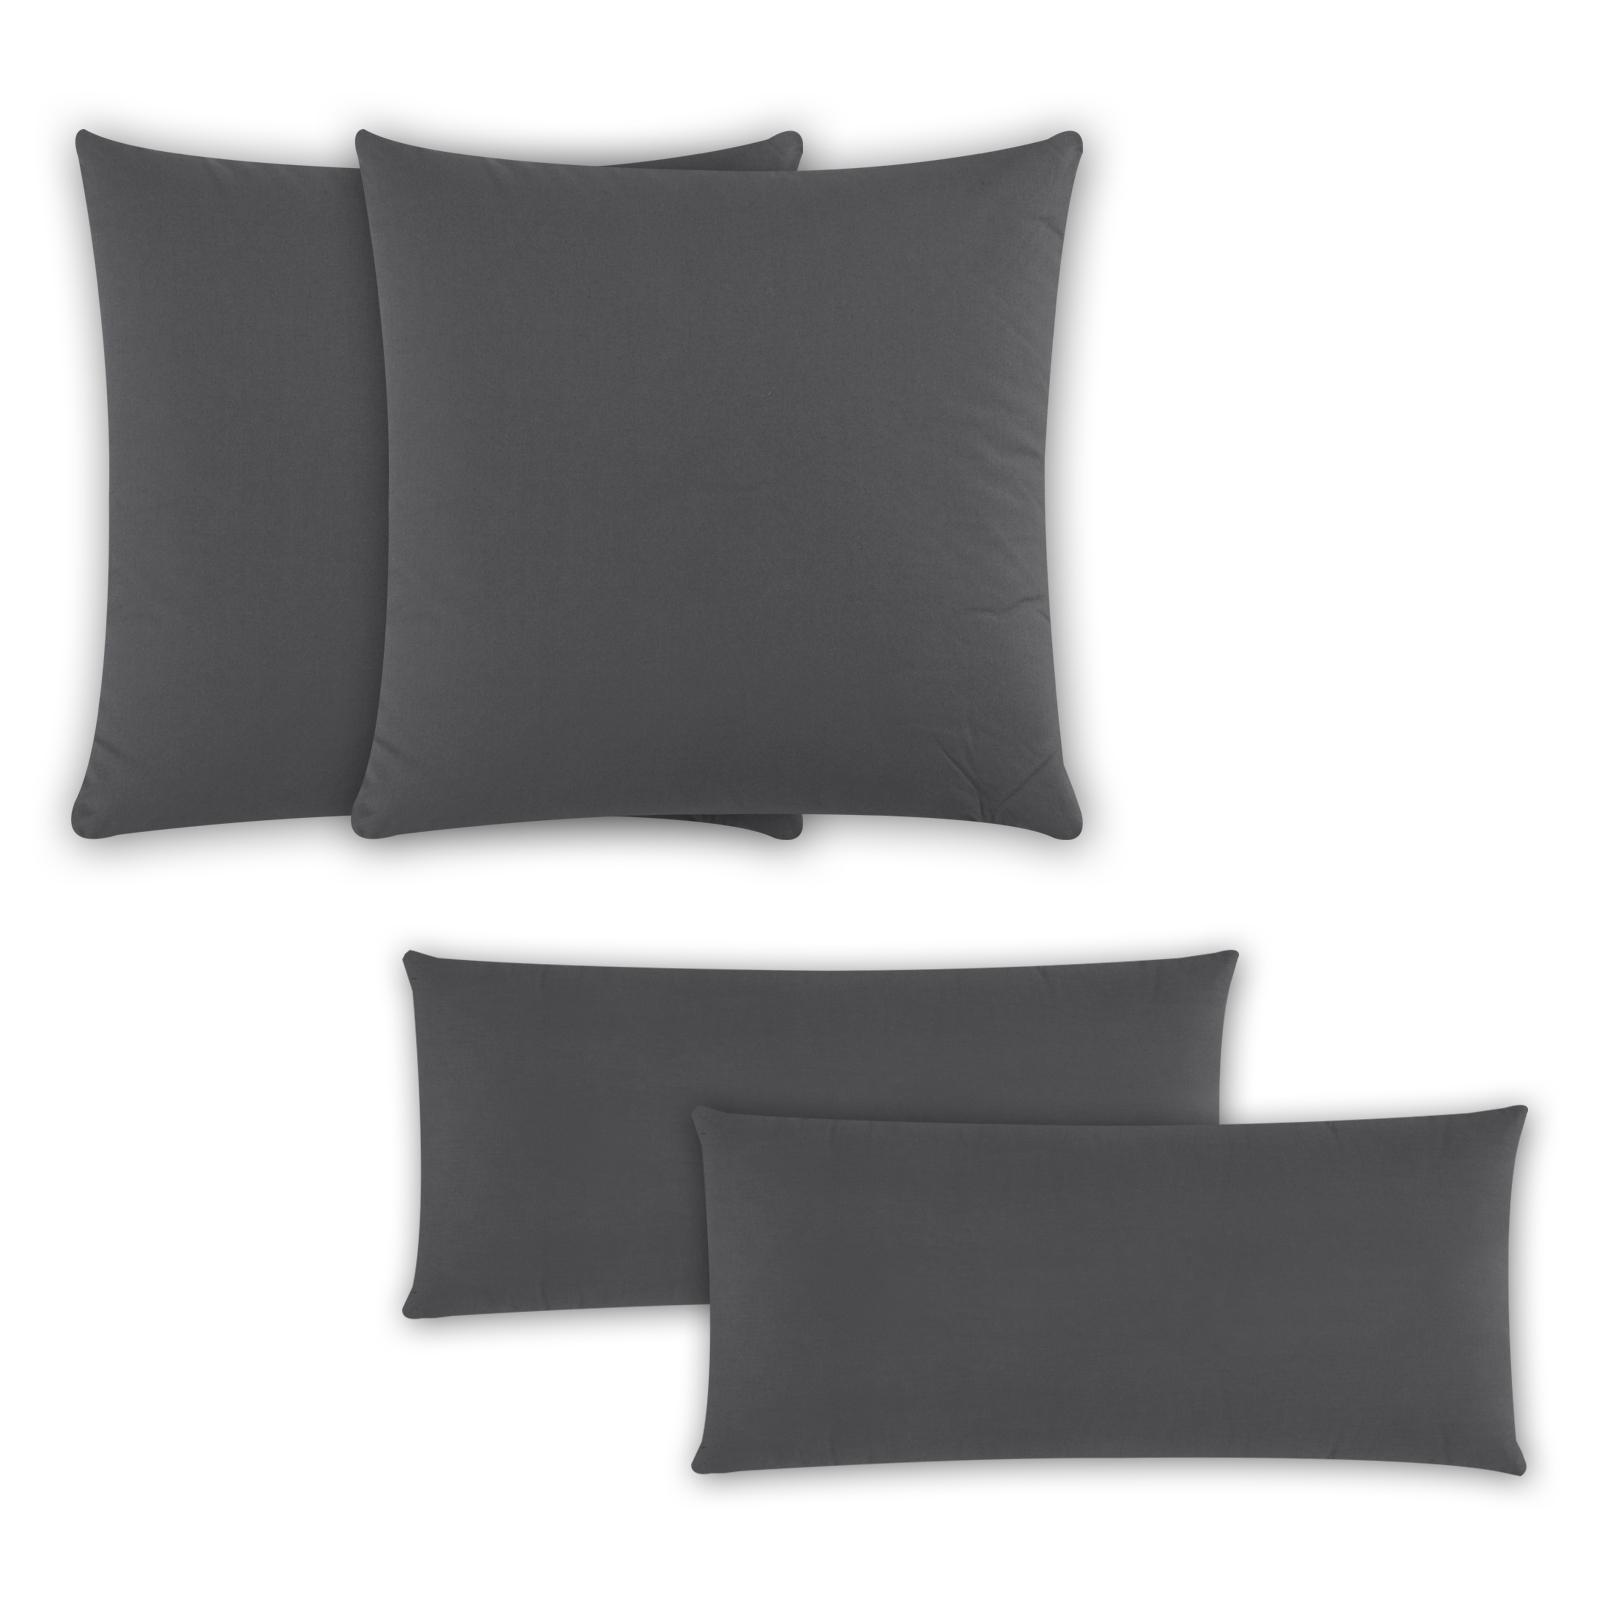 2er-Pack-Renforce-Baumwolle-Kissenbezug-Kissenhuelle-Kissen-Dekokissen-Uni-Farben